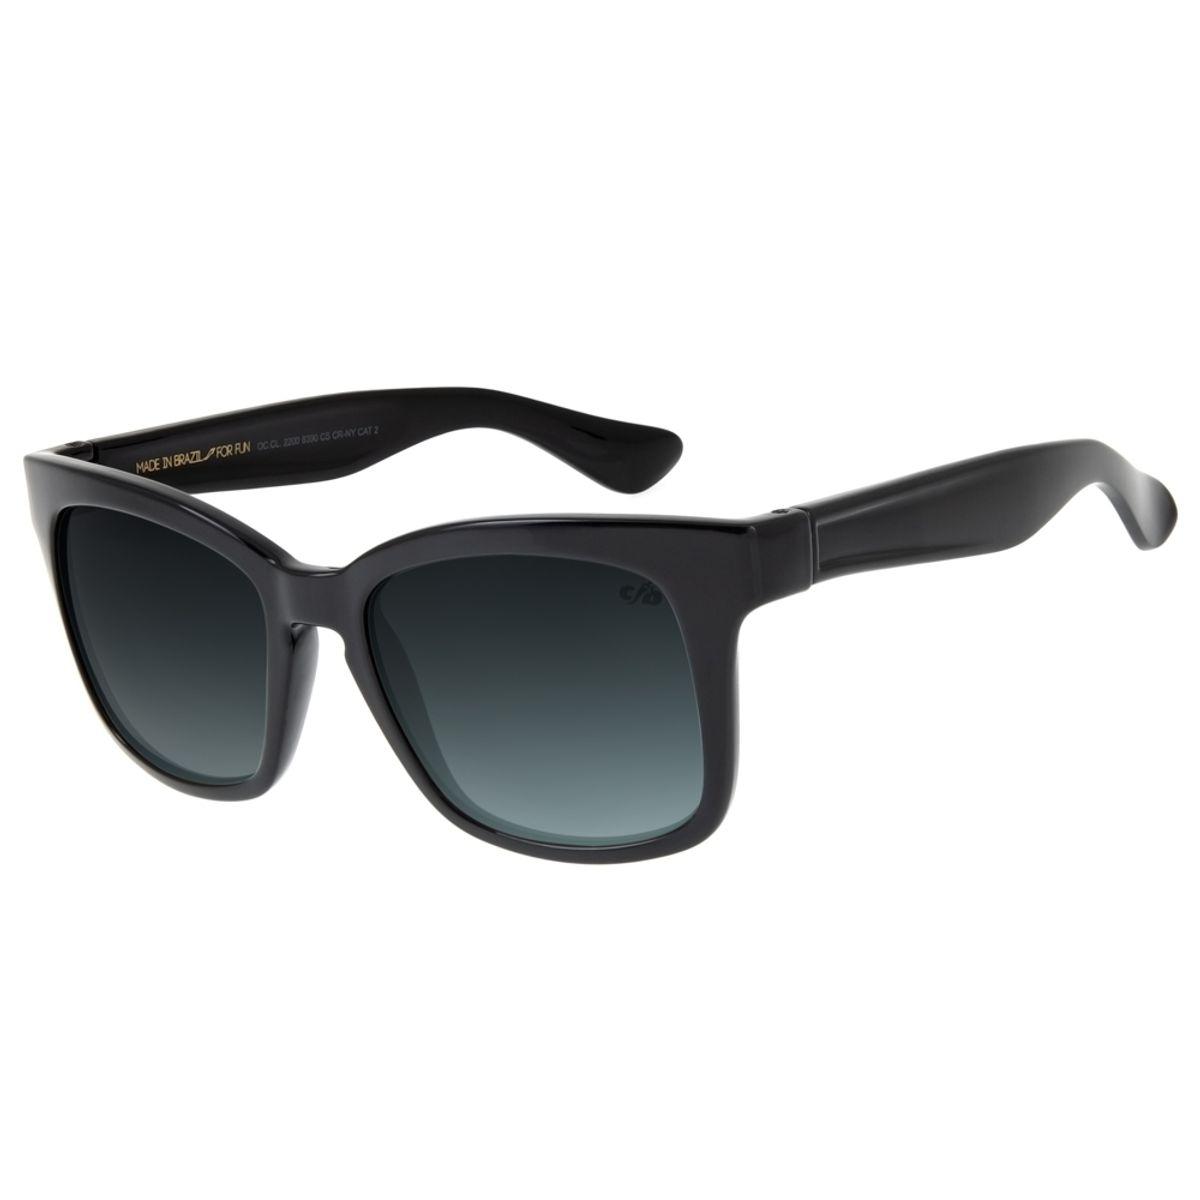 70f3696f0 Óculos de Sol Feminino Chilli Beans Quadrado Marrom Azul Escuro ...